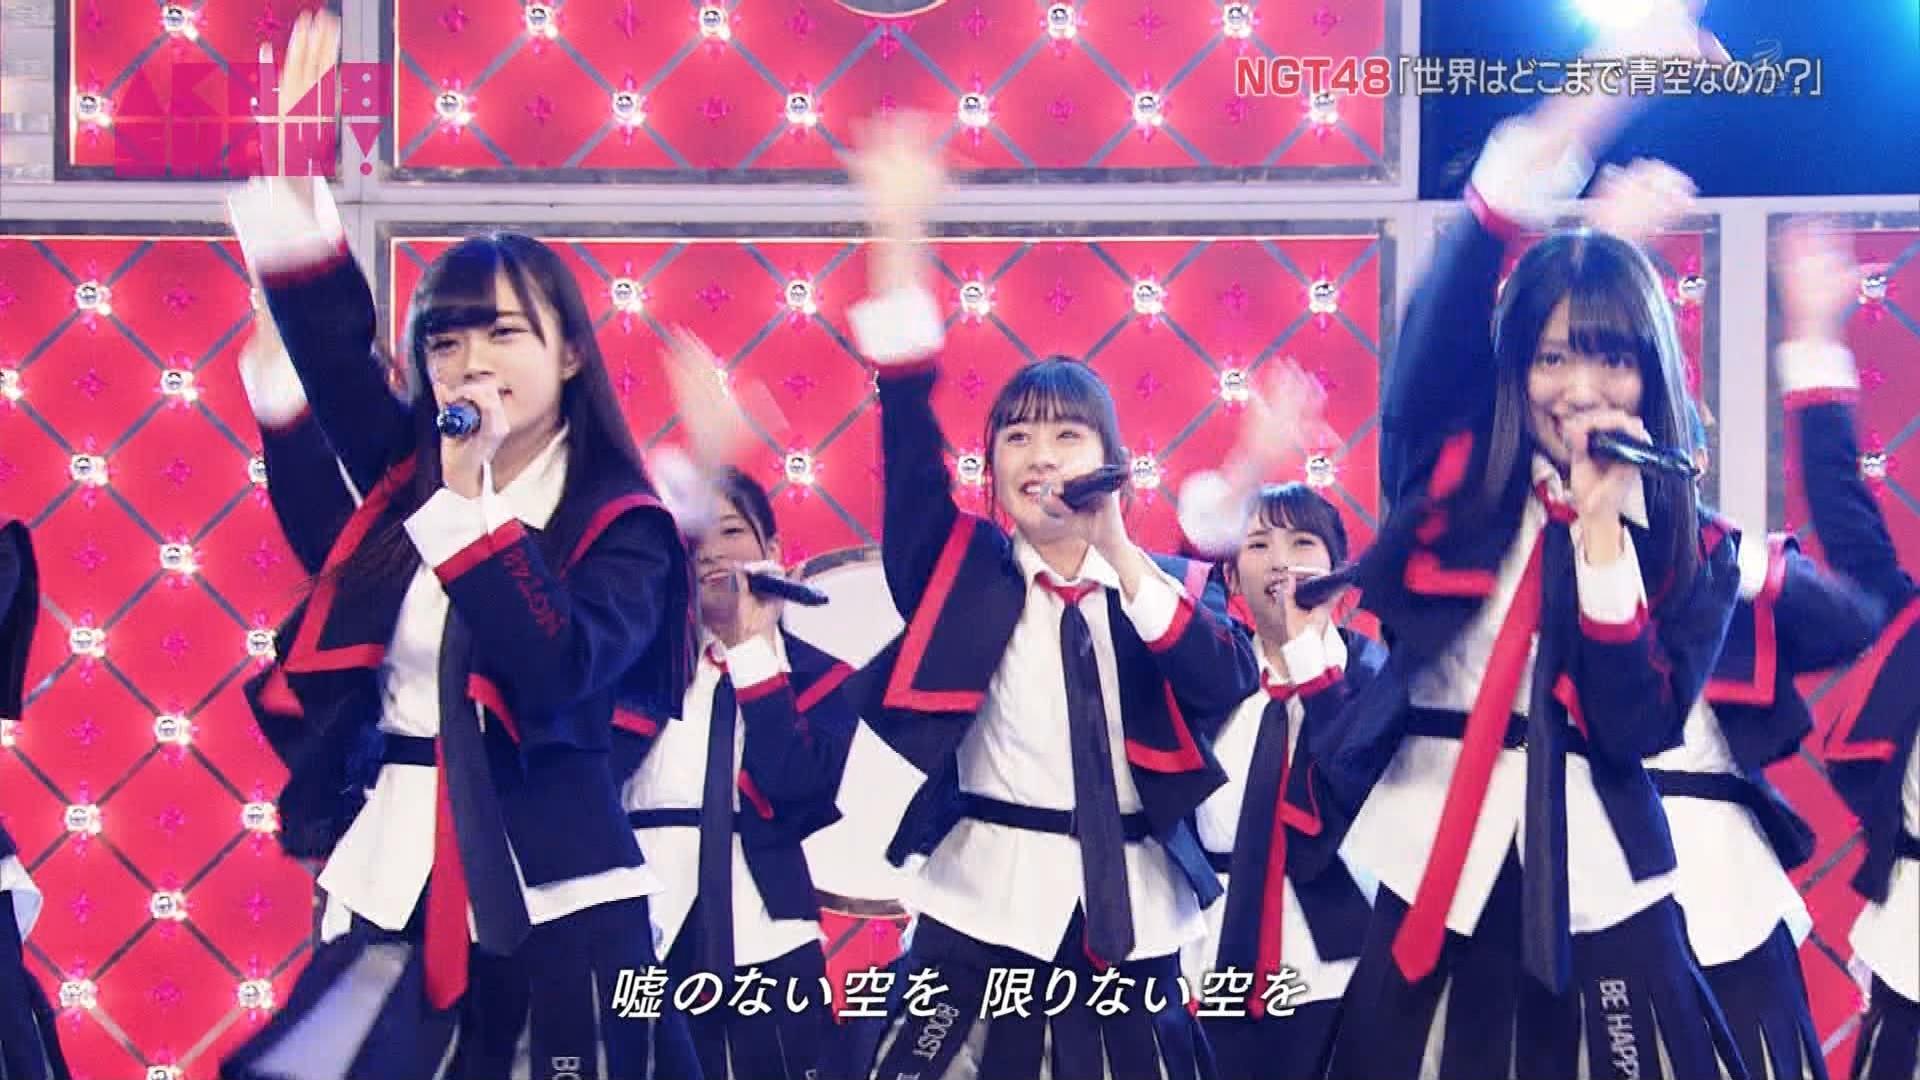 【NGT48】北原里英応援スレ☆Part762【きたりえ】 YouTube動画>6本 ->画像>363枚